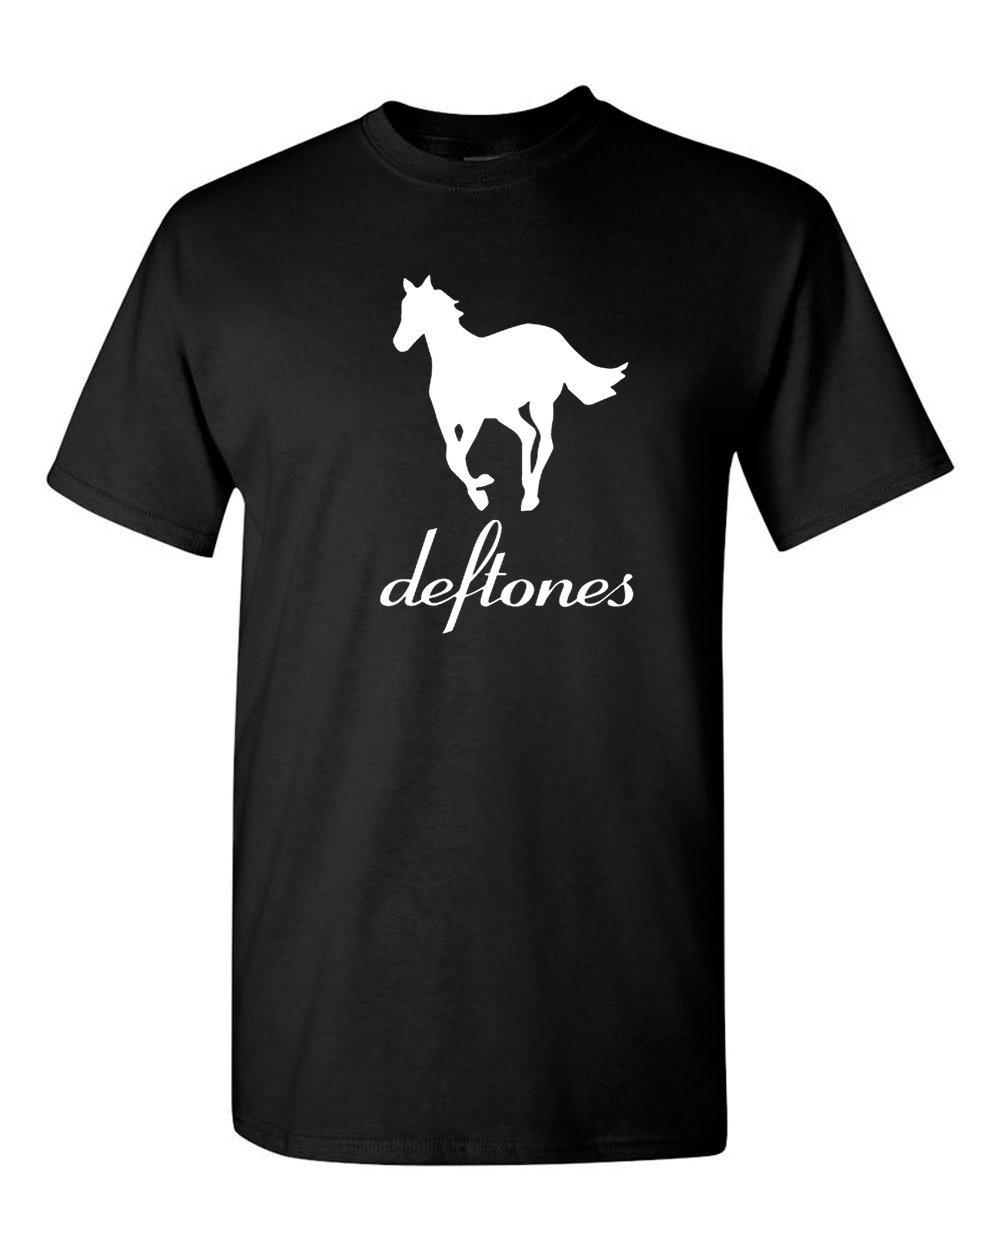 New Deftones Pony Rock Band Logo S Black Tshirt S To 3